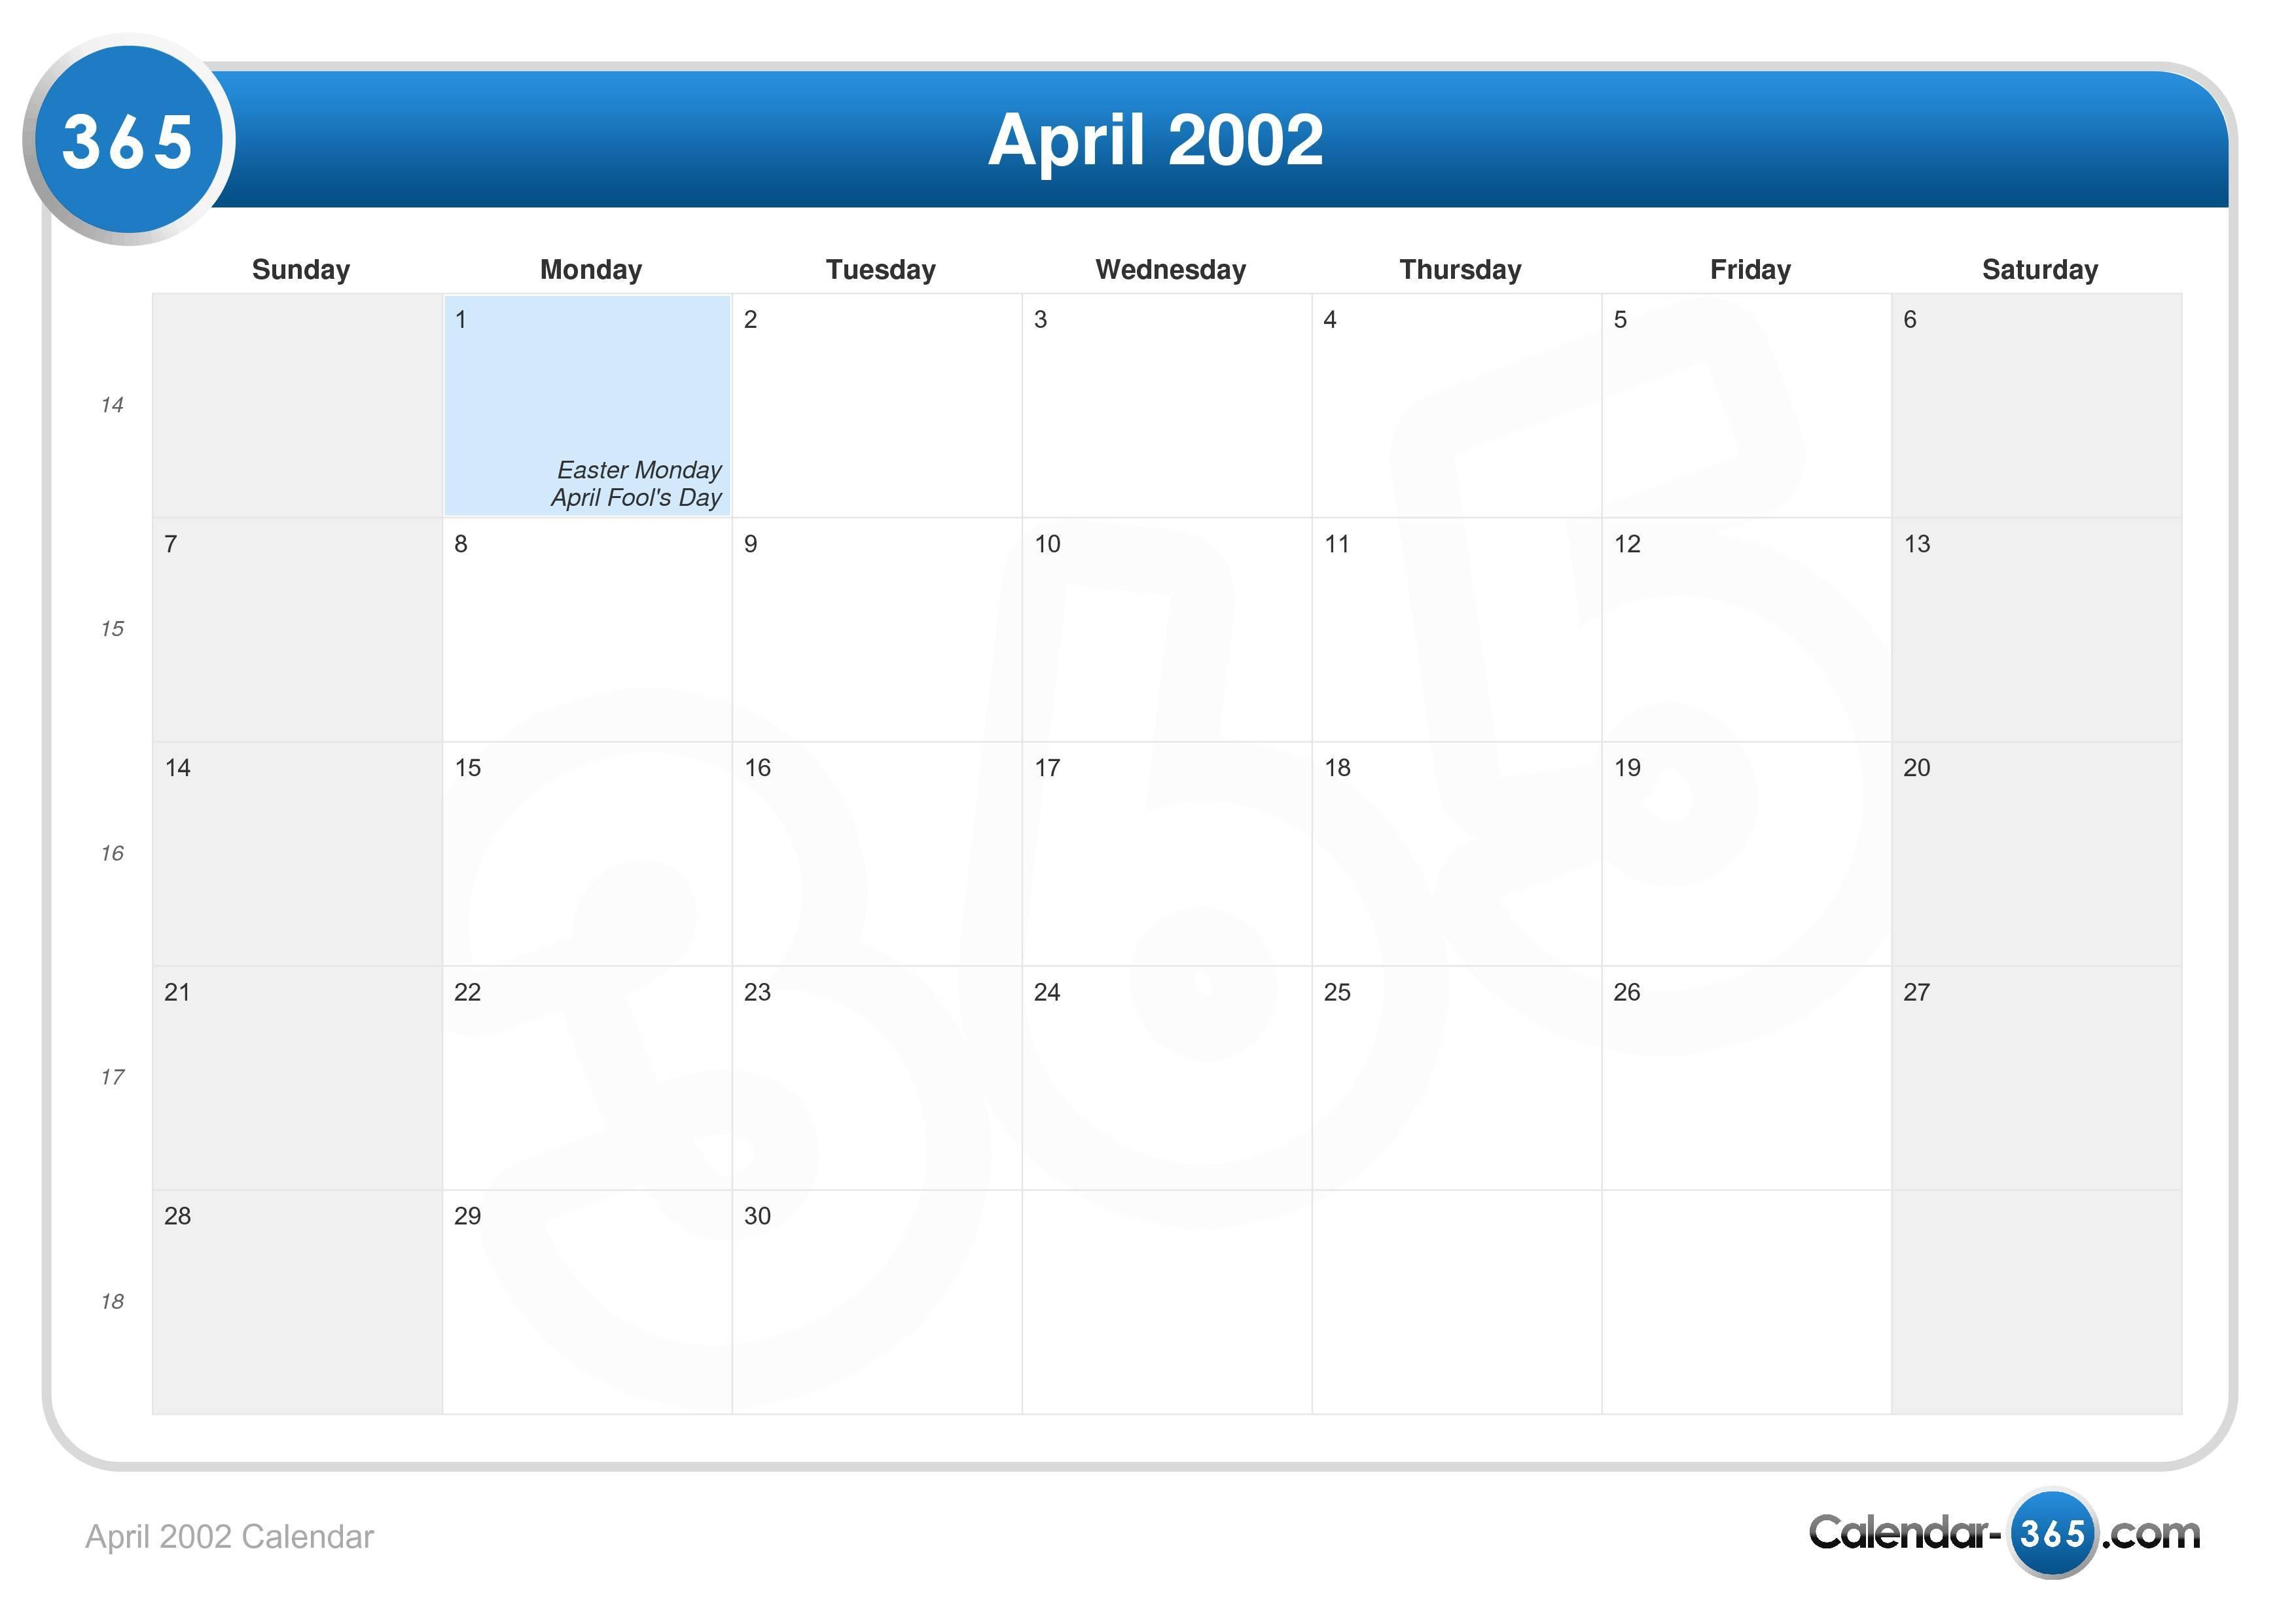 April 2002 Calendar  April 2002 Cale...